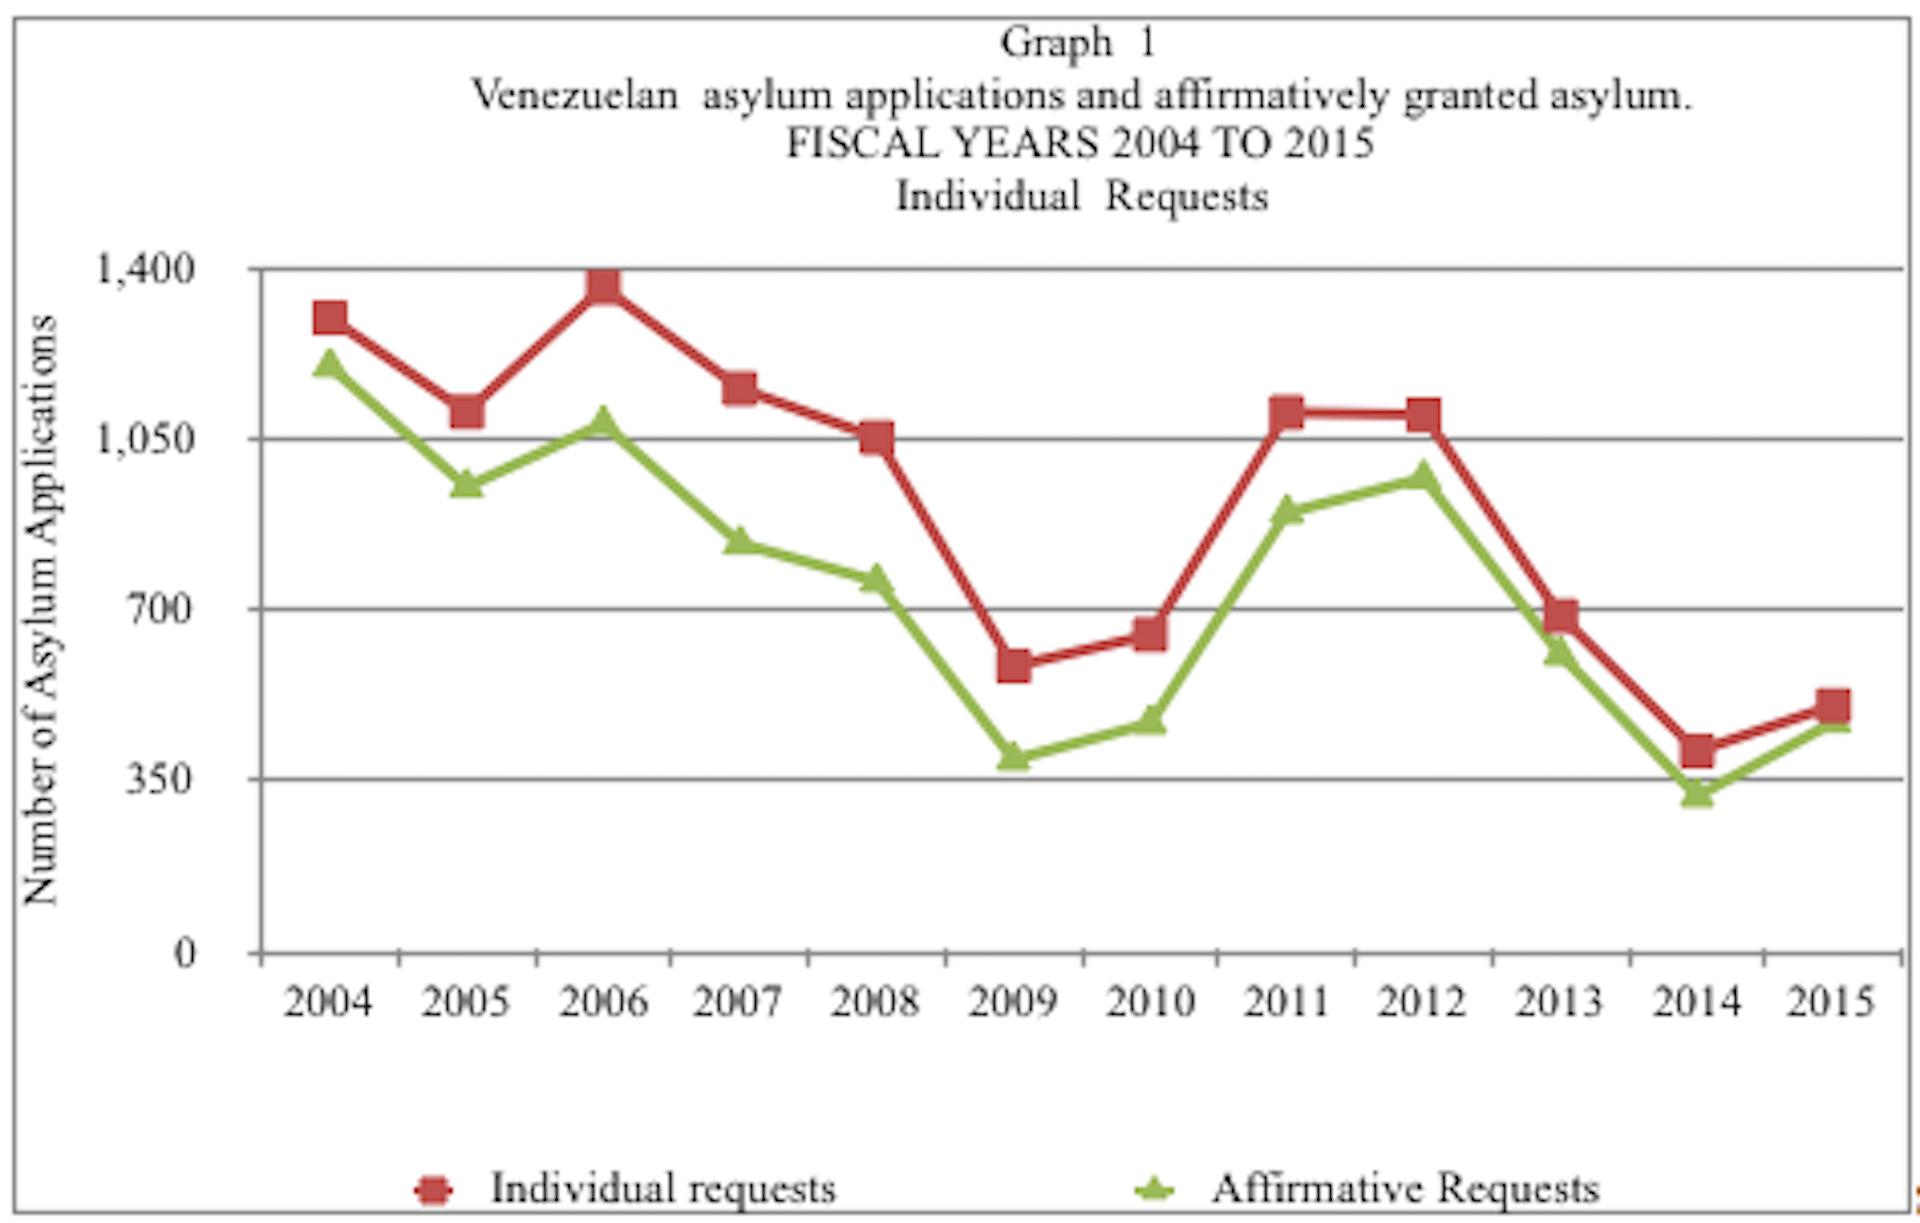 Thousands Flee Violence And Hunger In Venezuela Seeking Asylum In